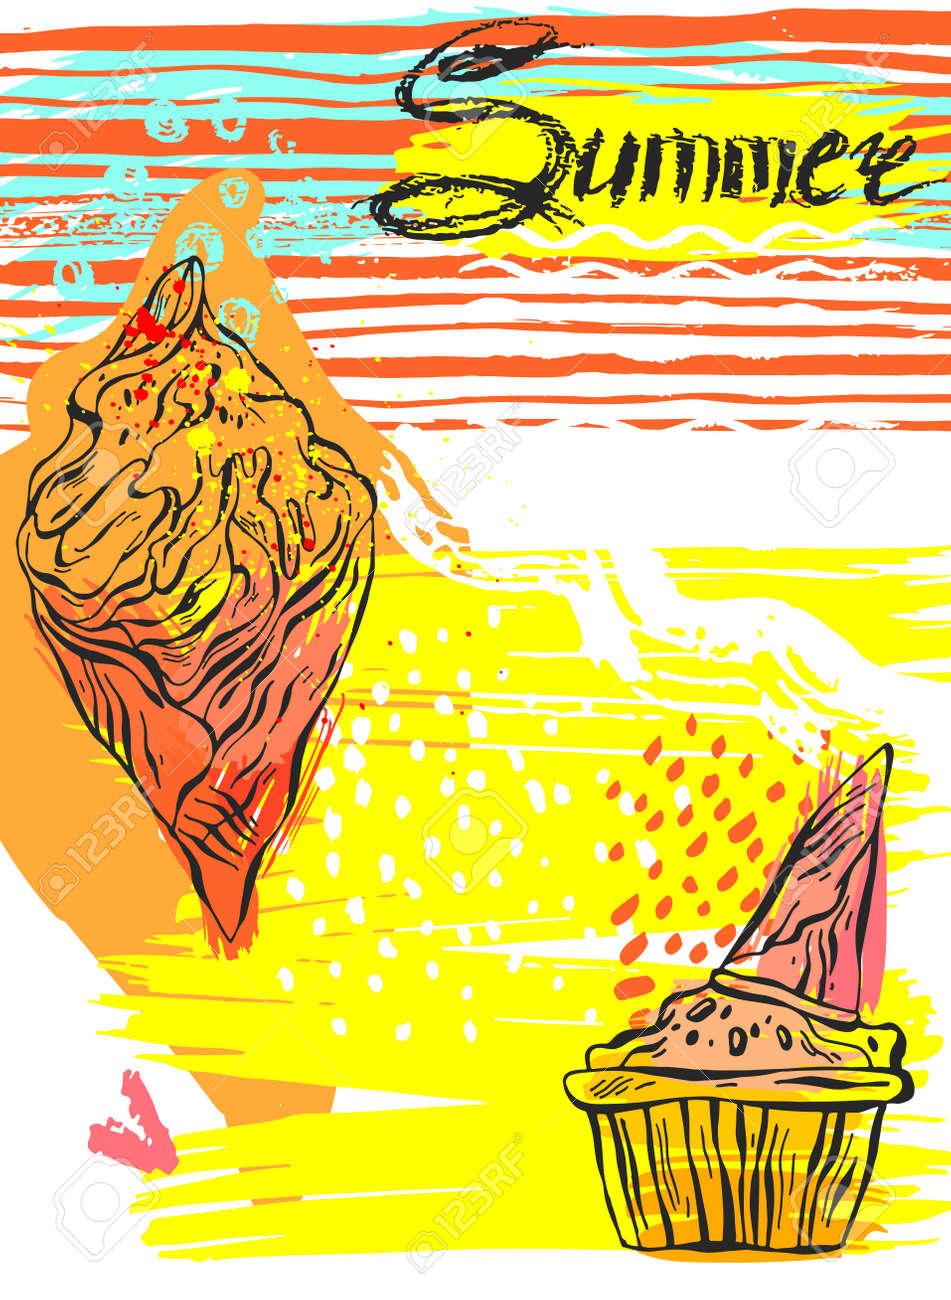 Design poster ice cream - Hand Drawn Textured Ice Cream Summer Card Design For Ice Cream Cafe Ice Cream